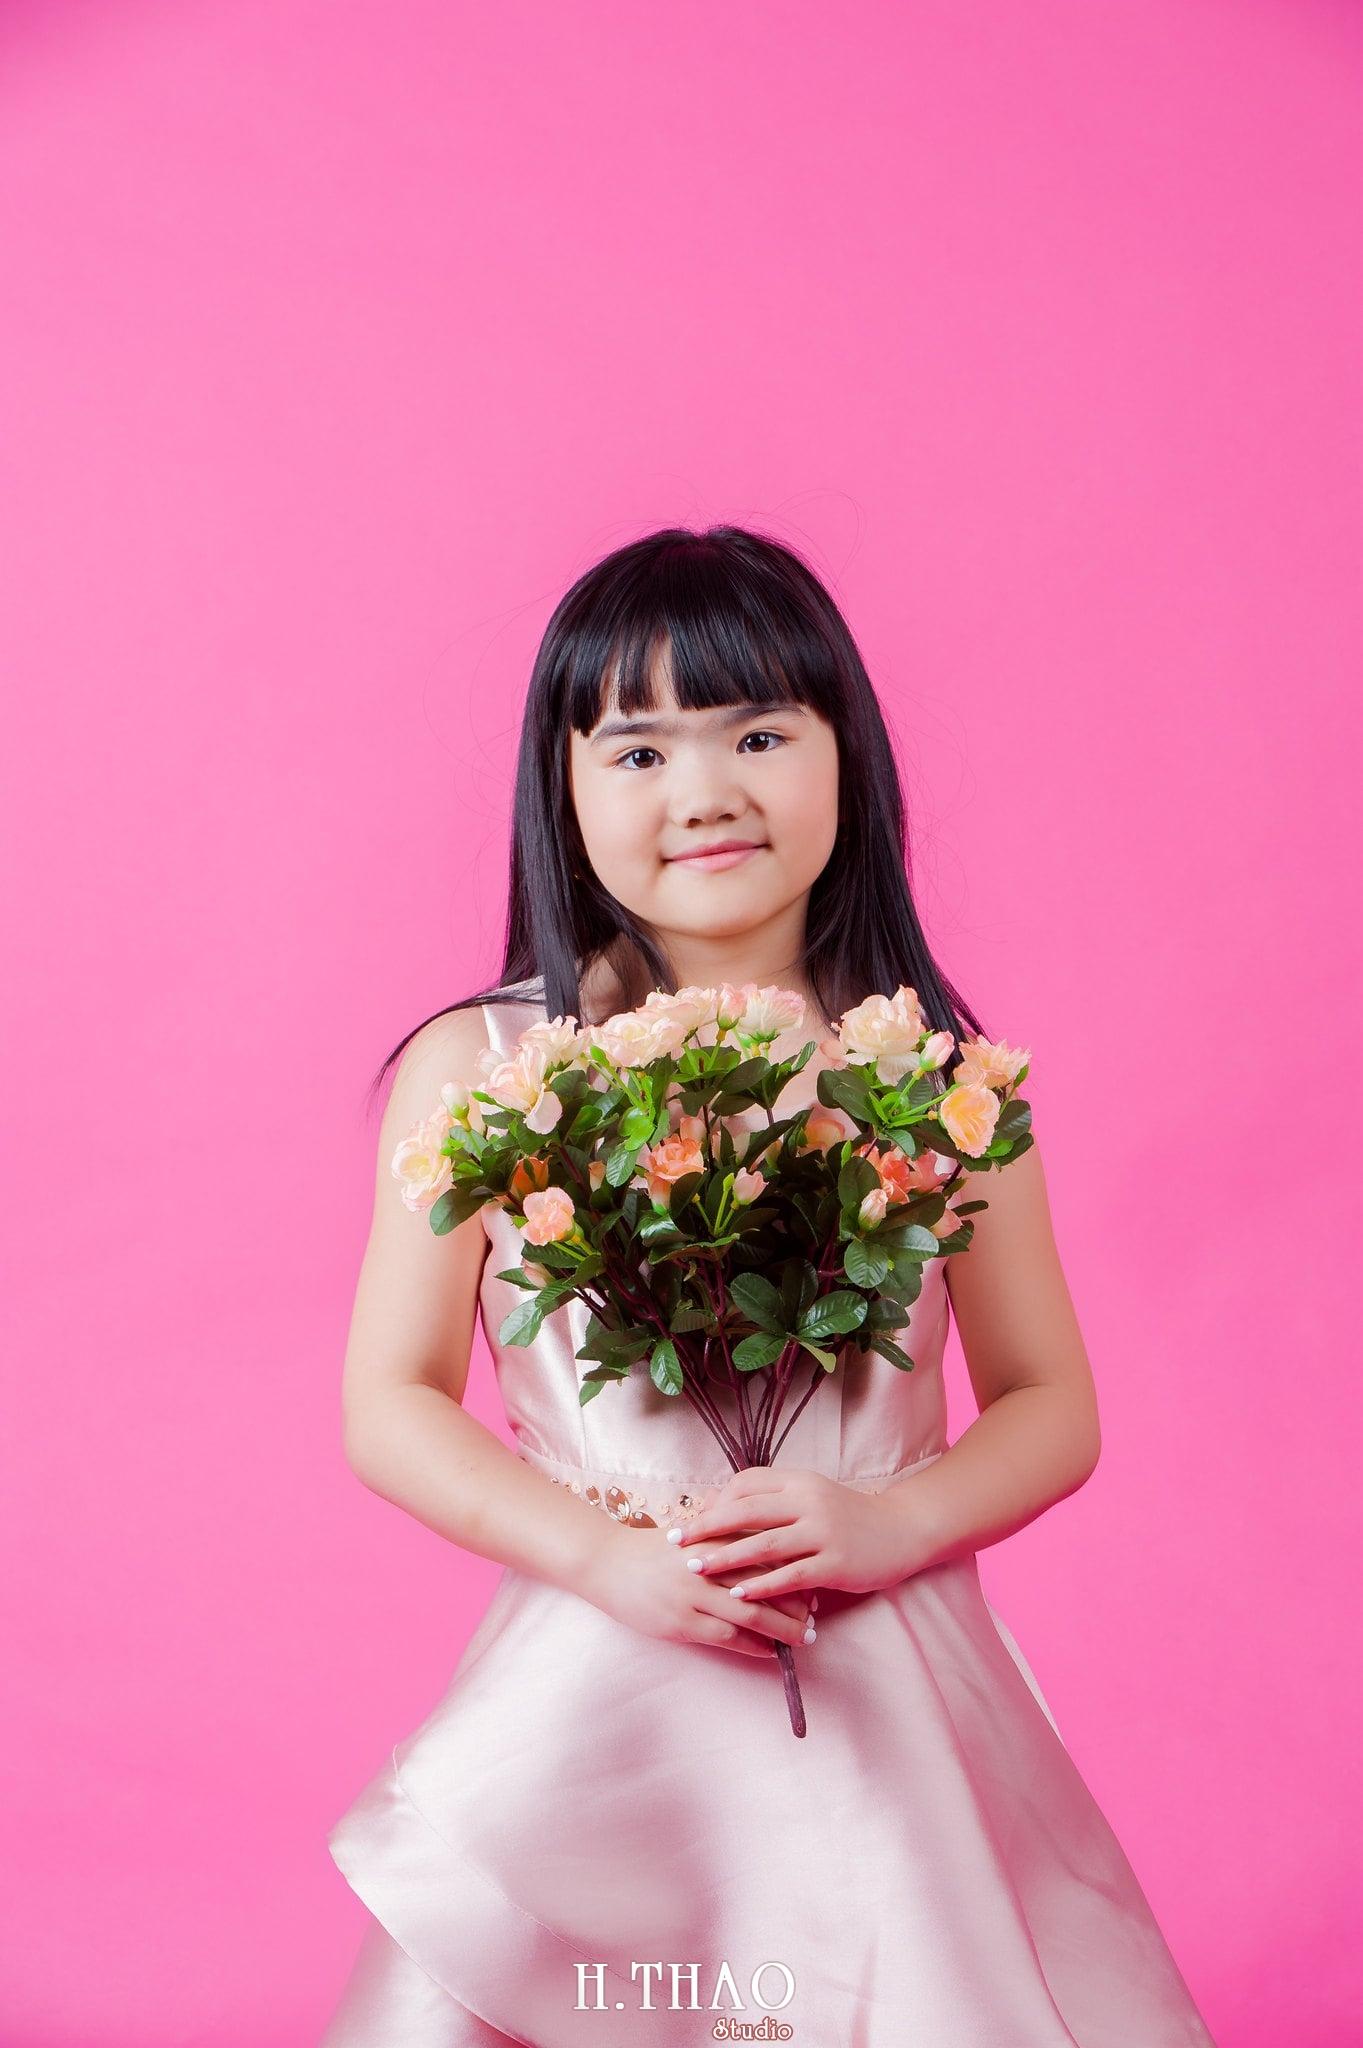 Anh gia dinh Jenny Nguyen 8 - Album ảnh gia đình chị Jenny Nguyễn - HThao Studio